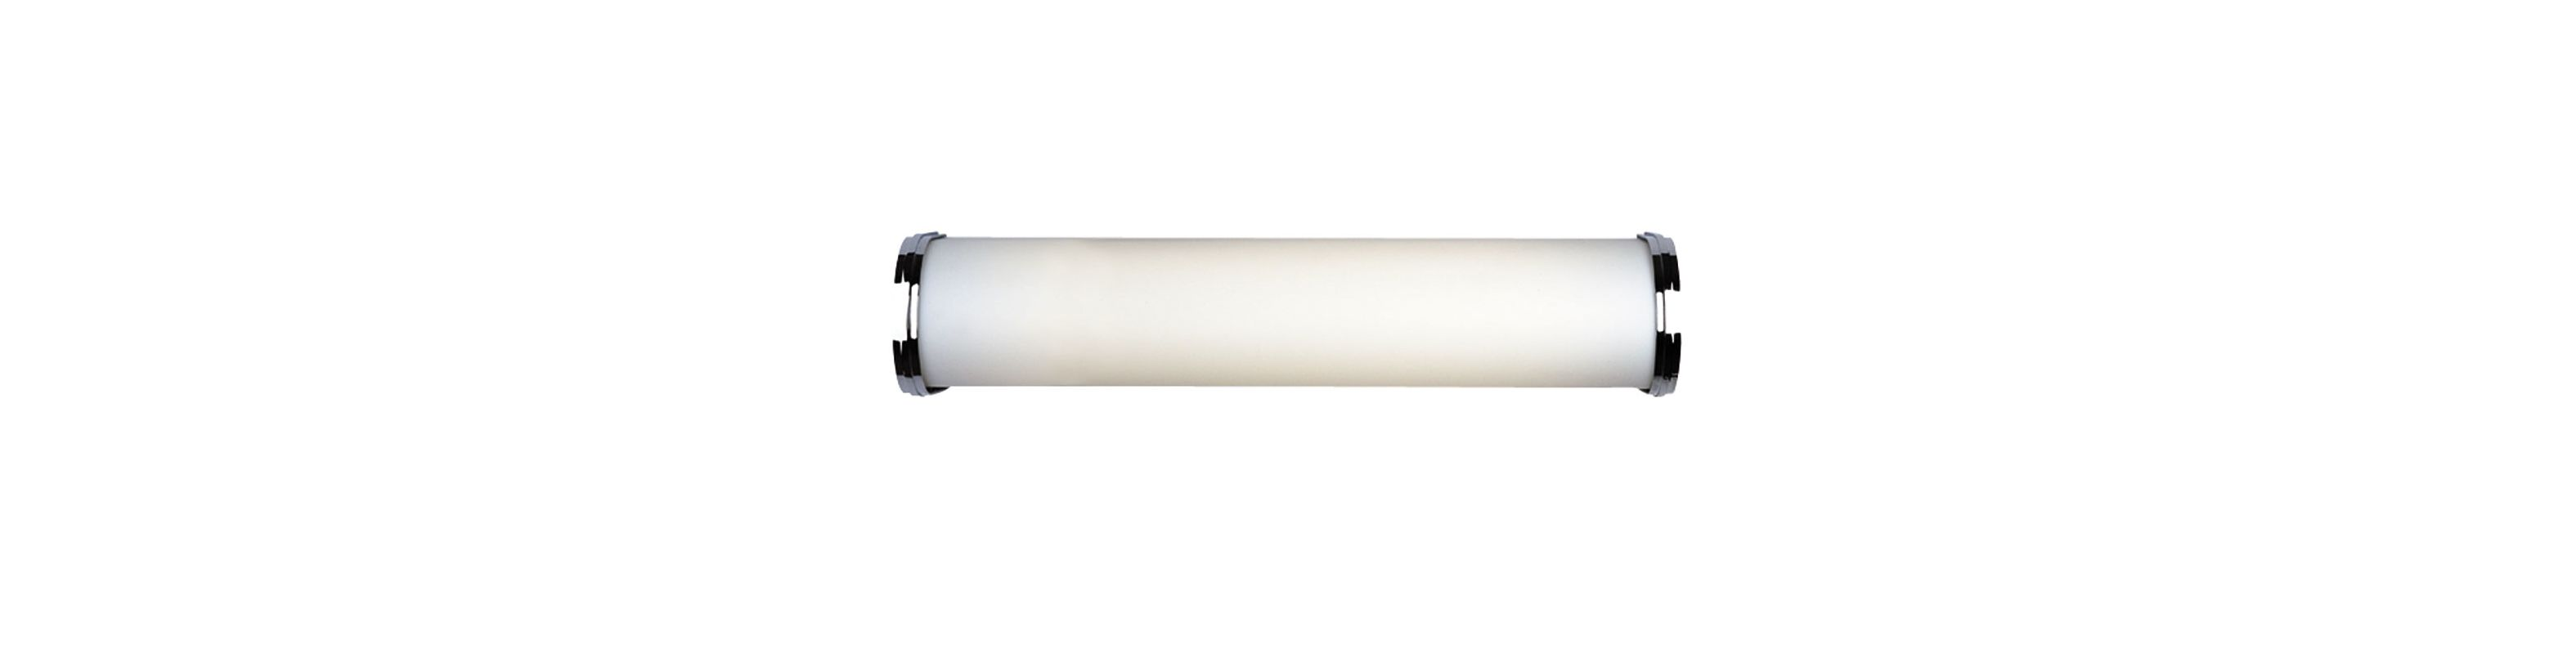 Philips F325336U Triple Bands 2 Light Bathroom Bath Bar Satin Nickel